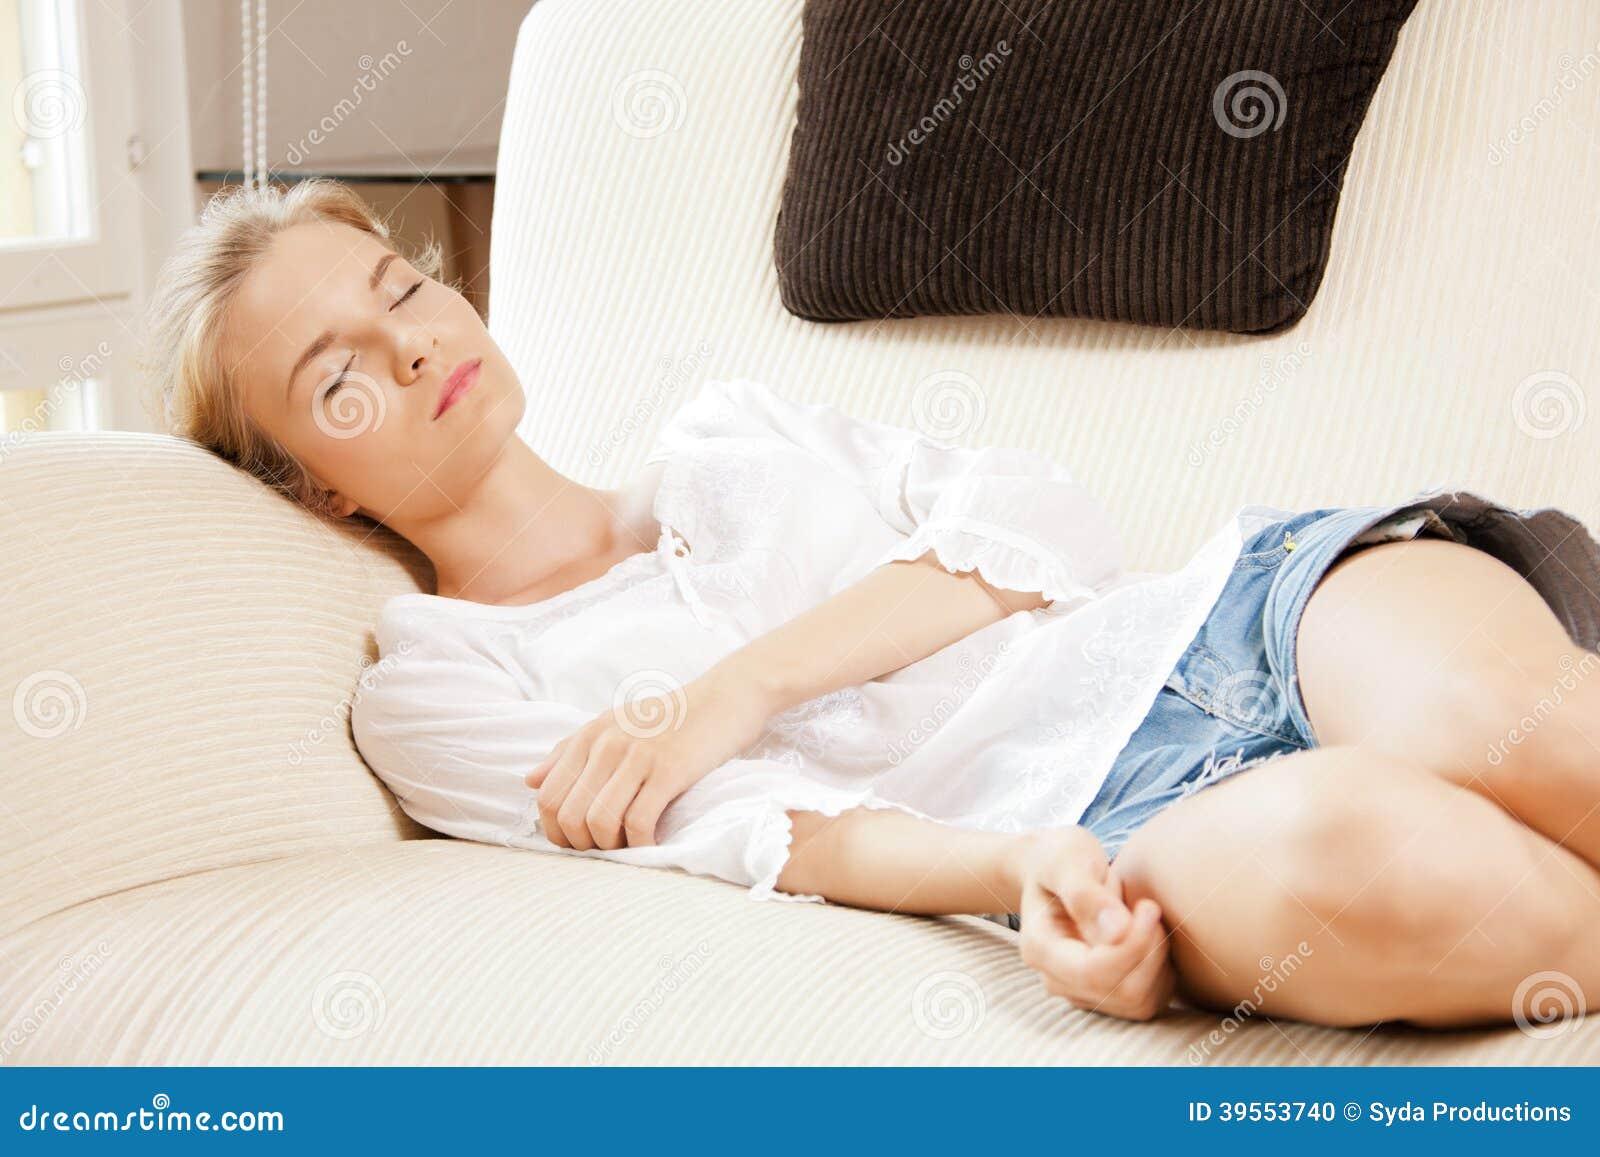 sleeping teenage girl at home stock photo image 39553740